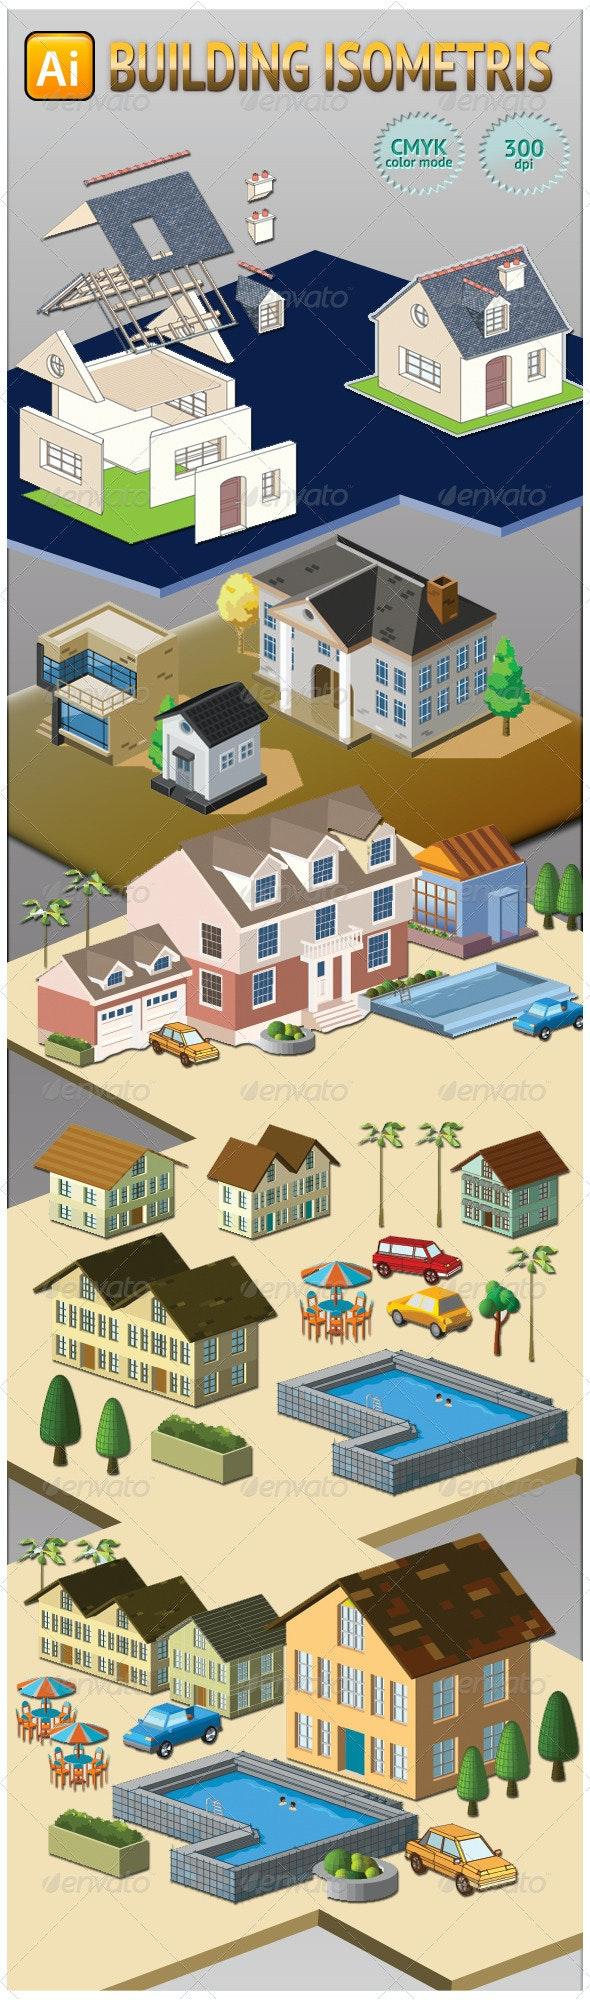 Building Isometris - Buildings Objects